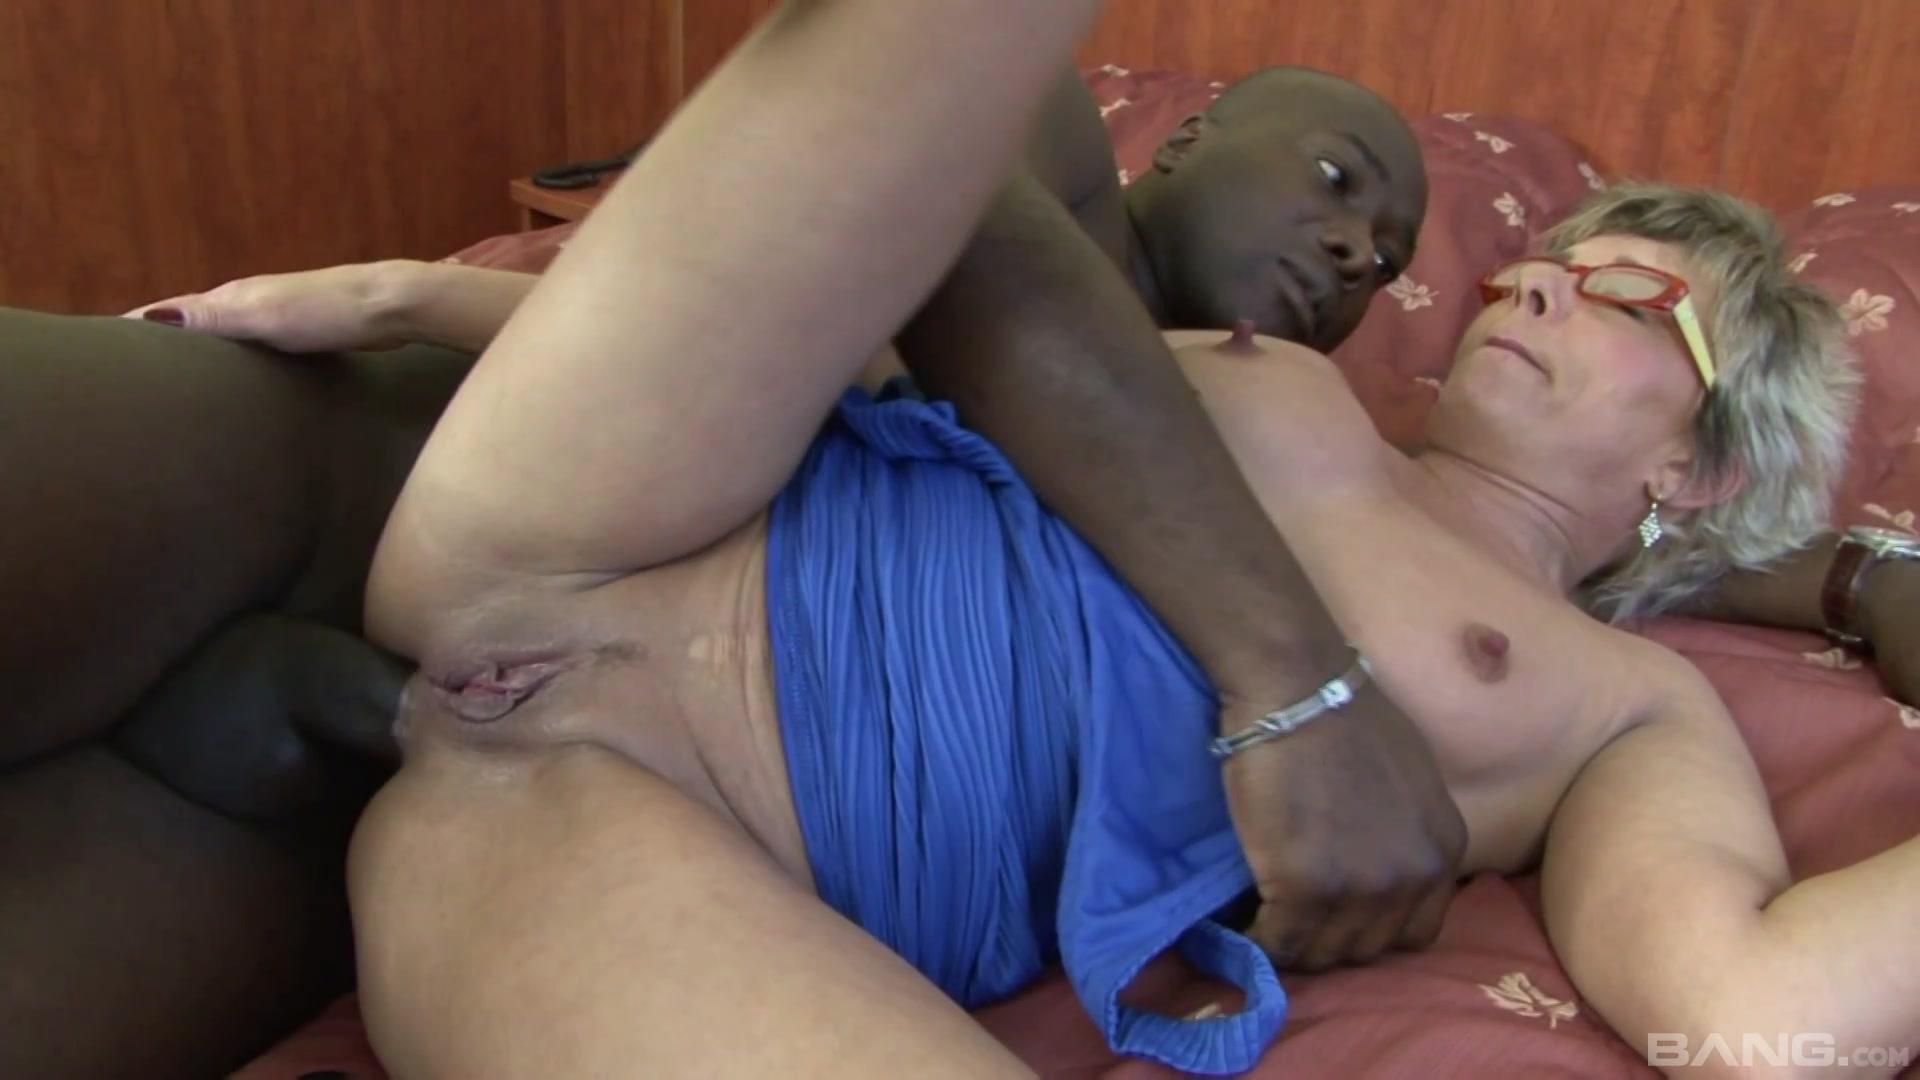 Tamil Maid S Asshole Free Porn